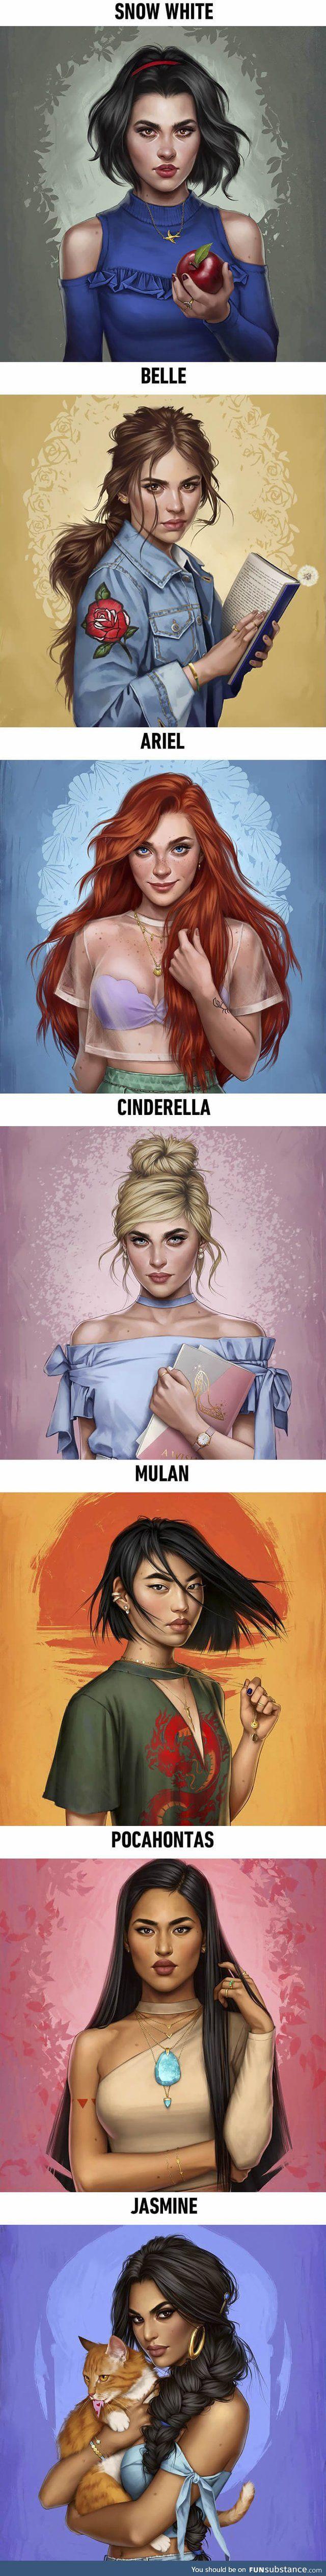 Disney princesses as modern day girls living now